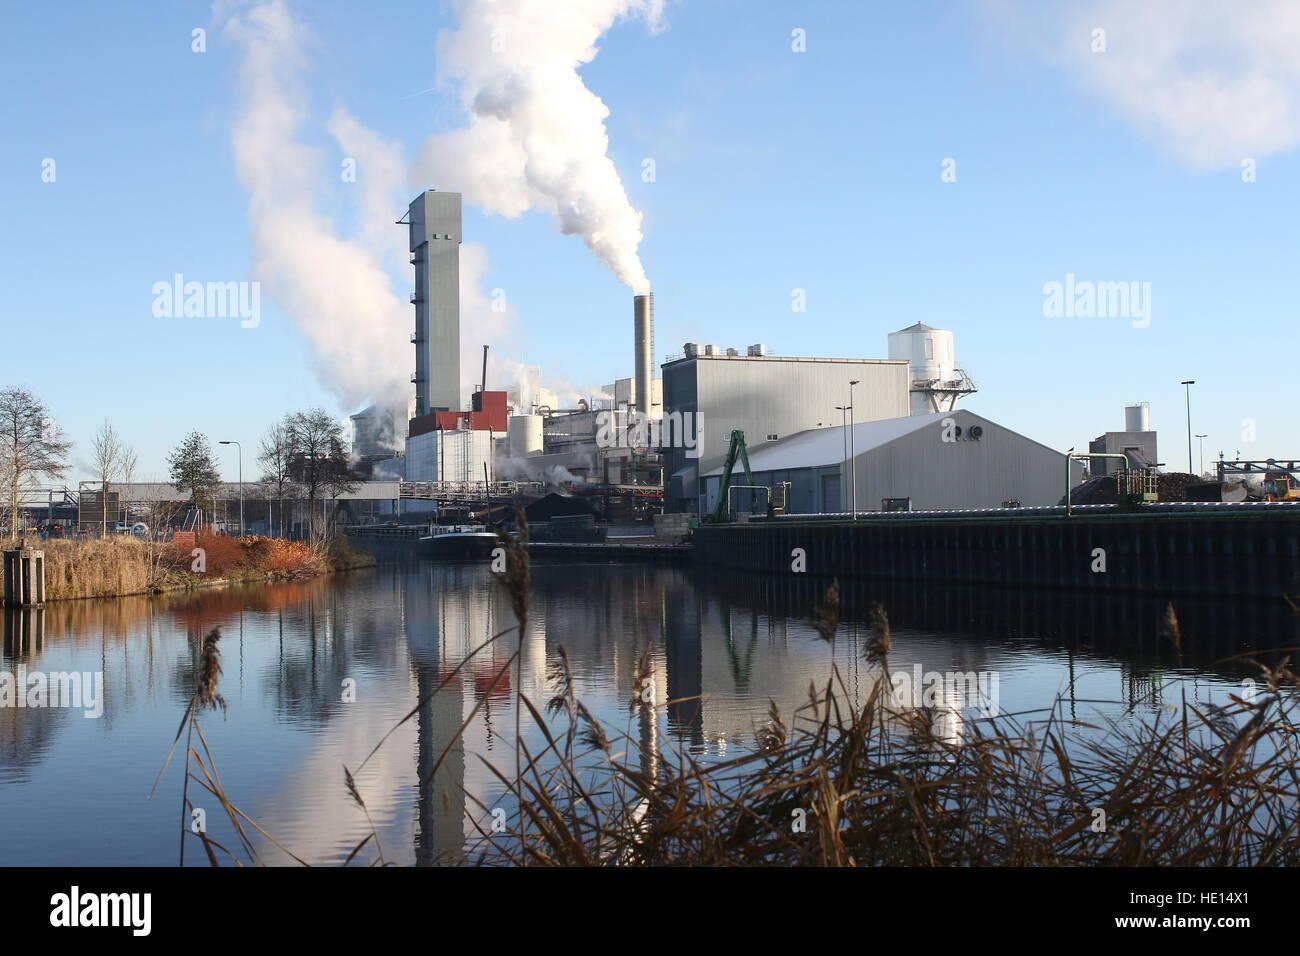 Suiker Unie Sugar (beet) refinery &  processing plant at in Hoogkerk - Vierverlaten, Groningen, Netherlands, - Stock Image